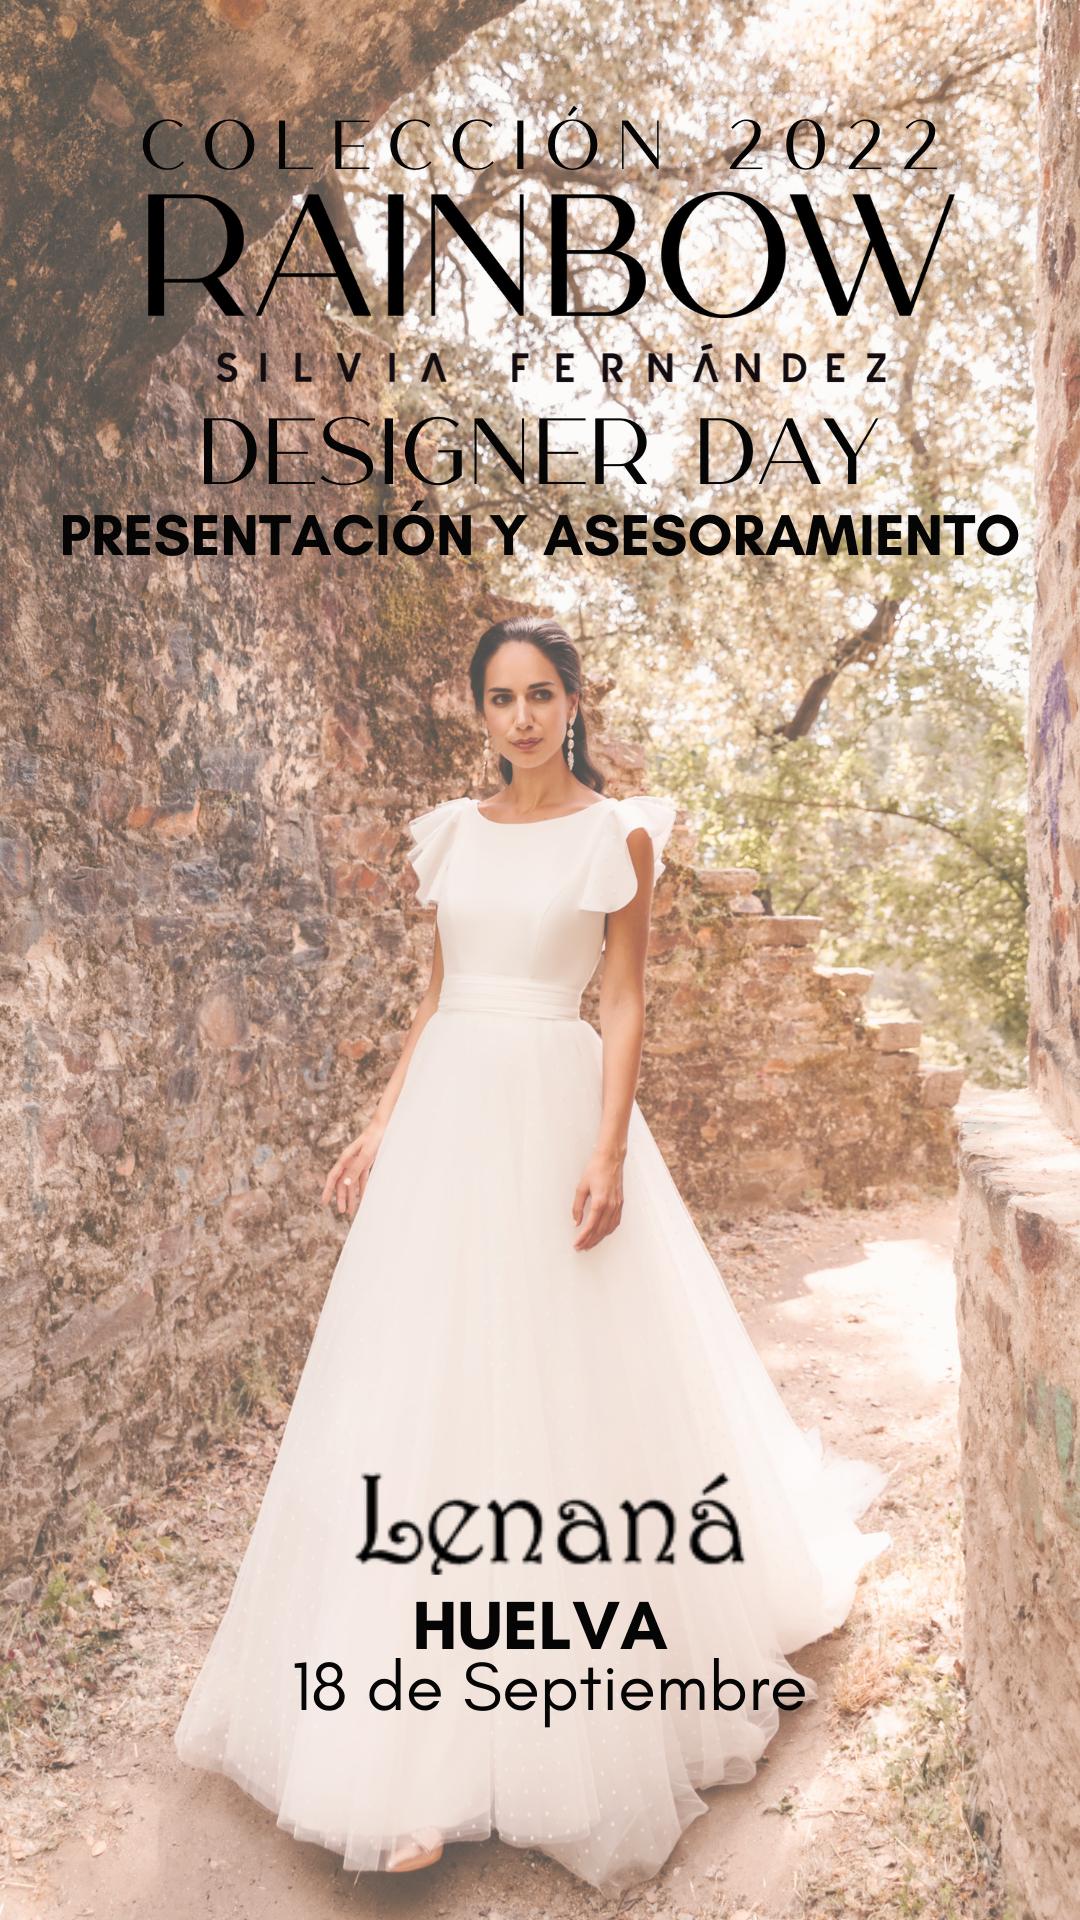 Evento Lenana - Silvia Fernandez